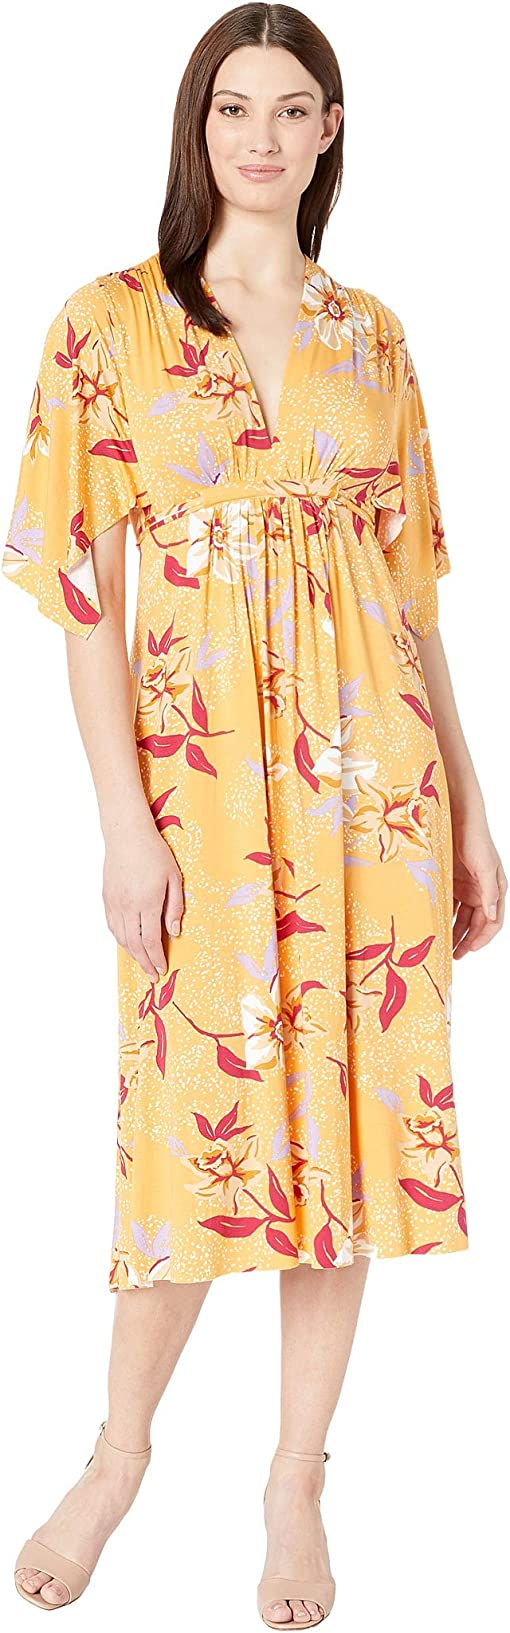 Daffodil Print